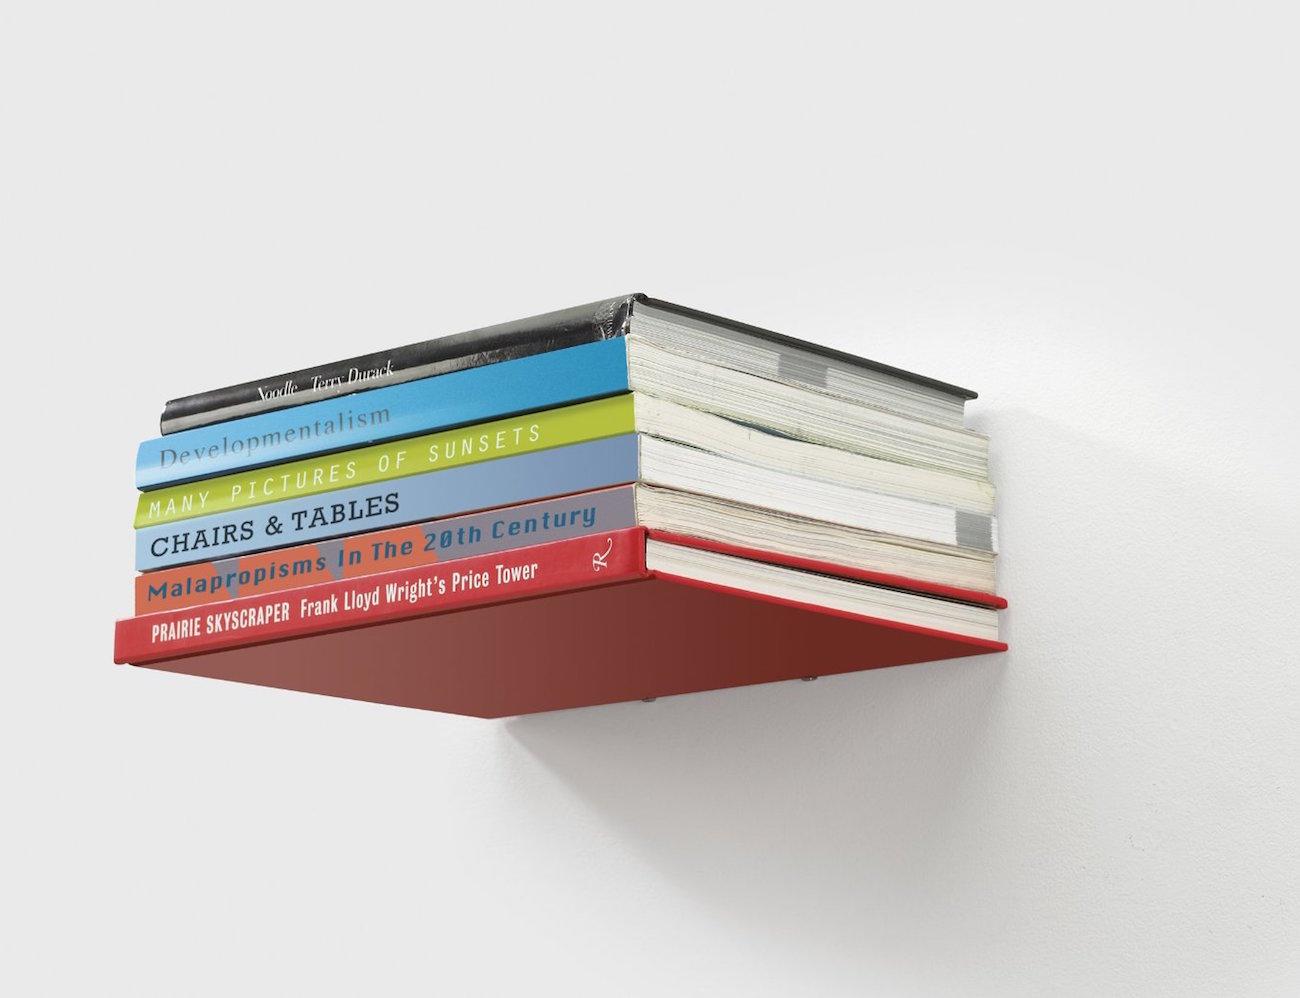 Fly-brary Book Shelf